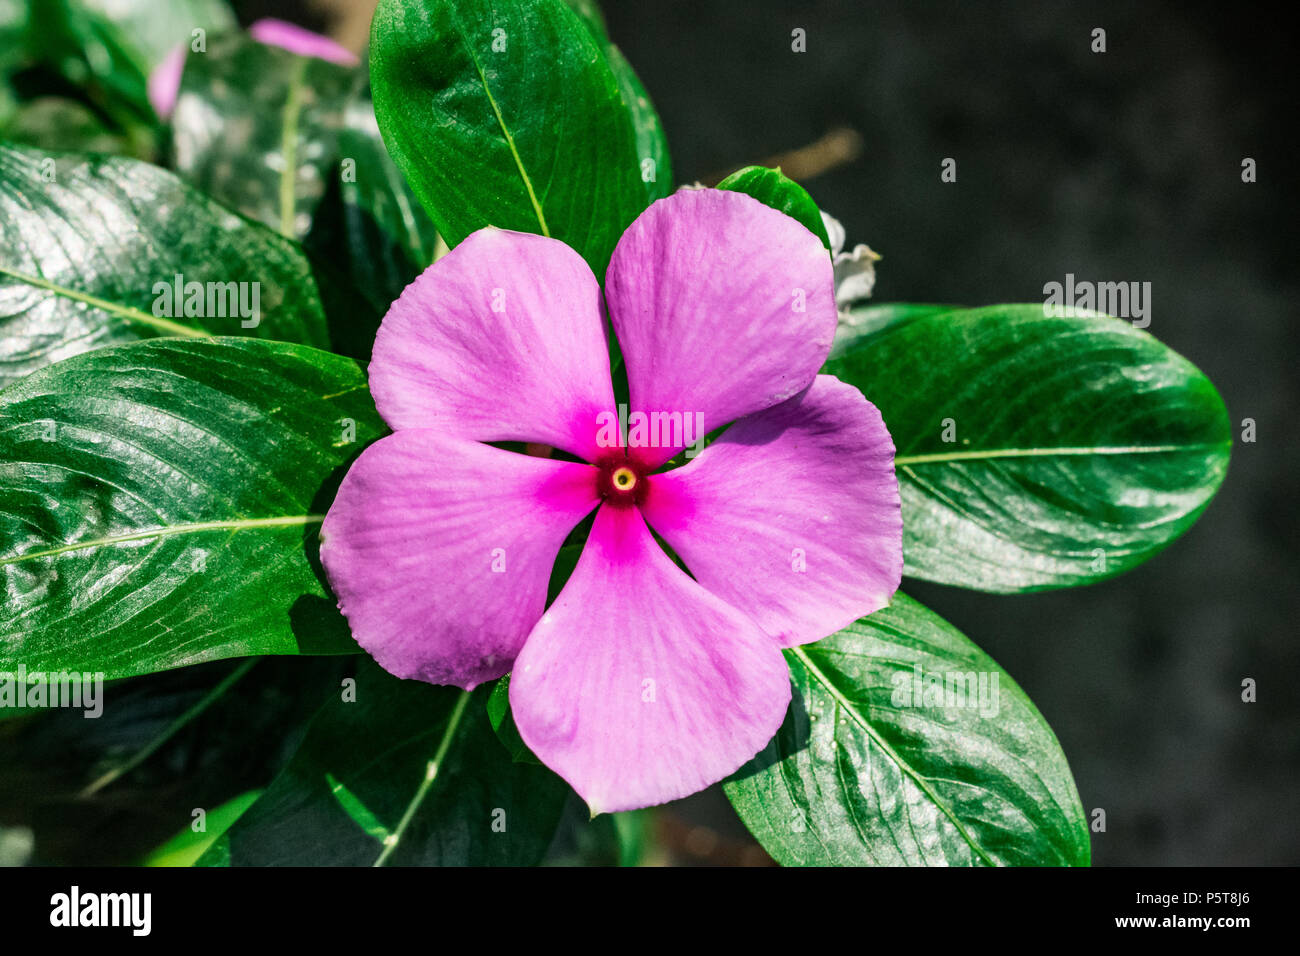 Fiori 5 Petali Rosa.Madagascar Pervinca Hot Cinque Petalo Fiore Cinque Petali Di Fiori